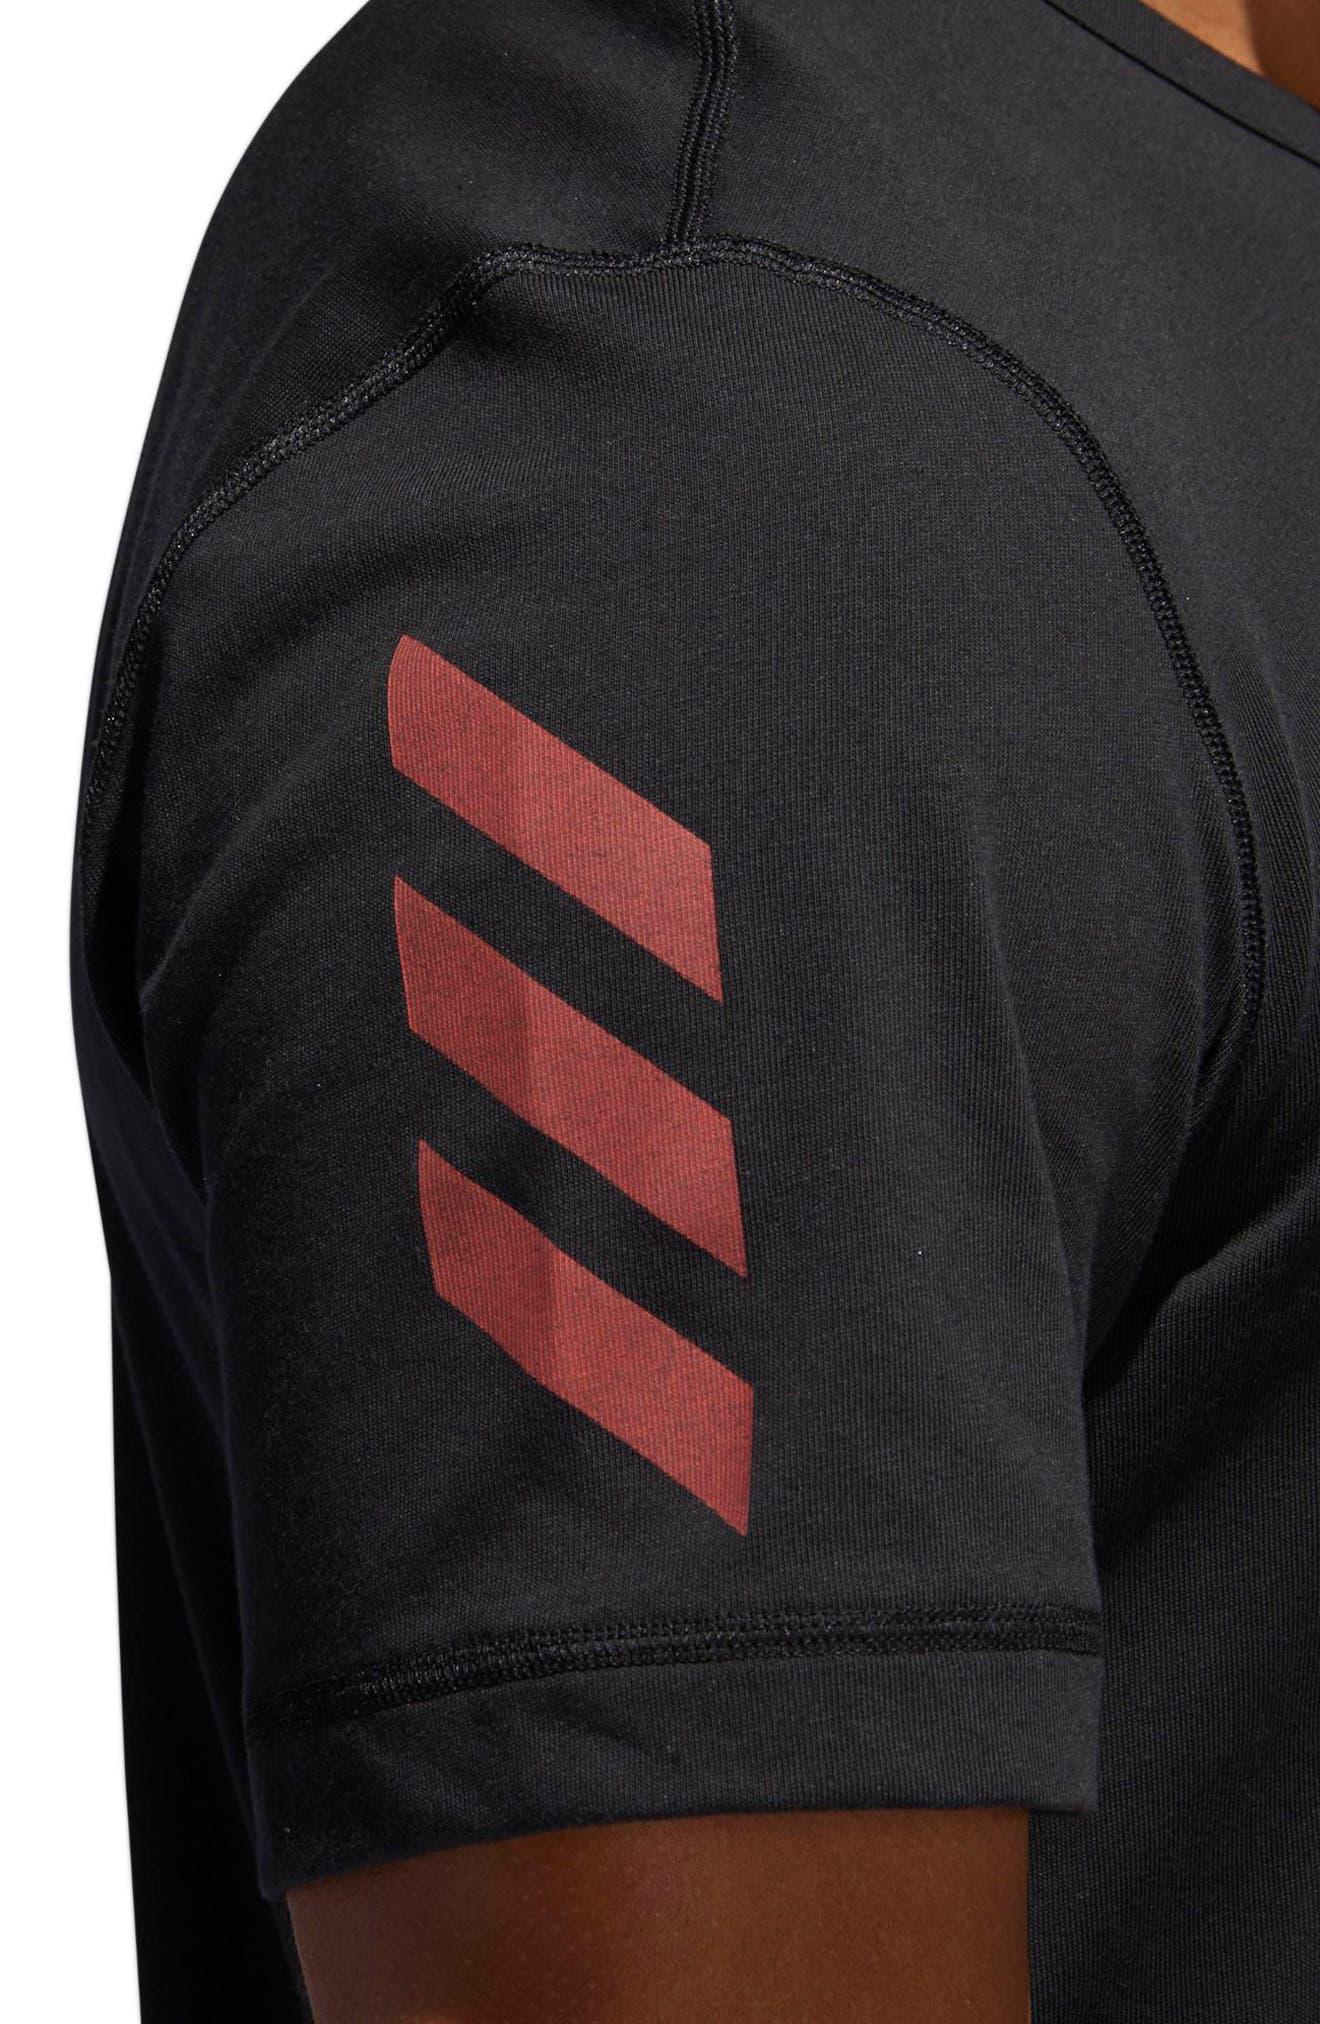 Harden Brand Slogan T-Shirt,                             Alternate thumbnail 7, color,